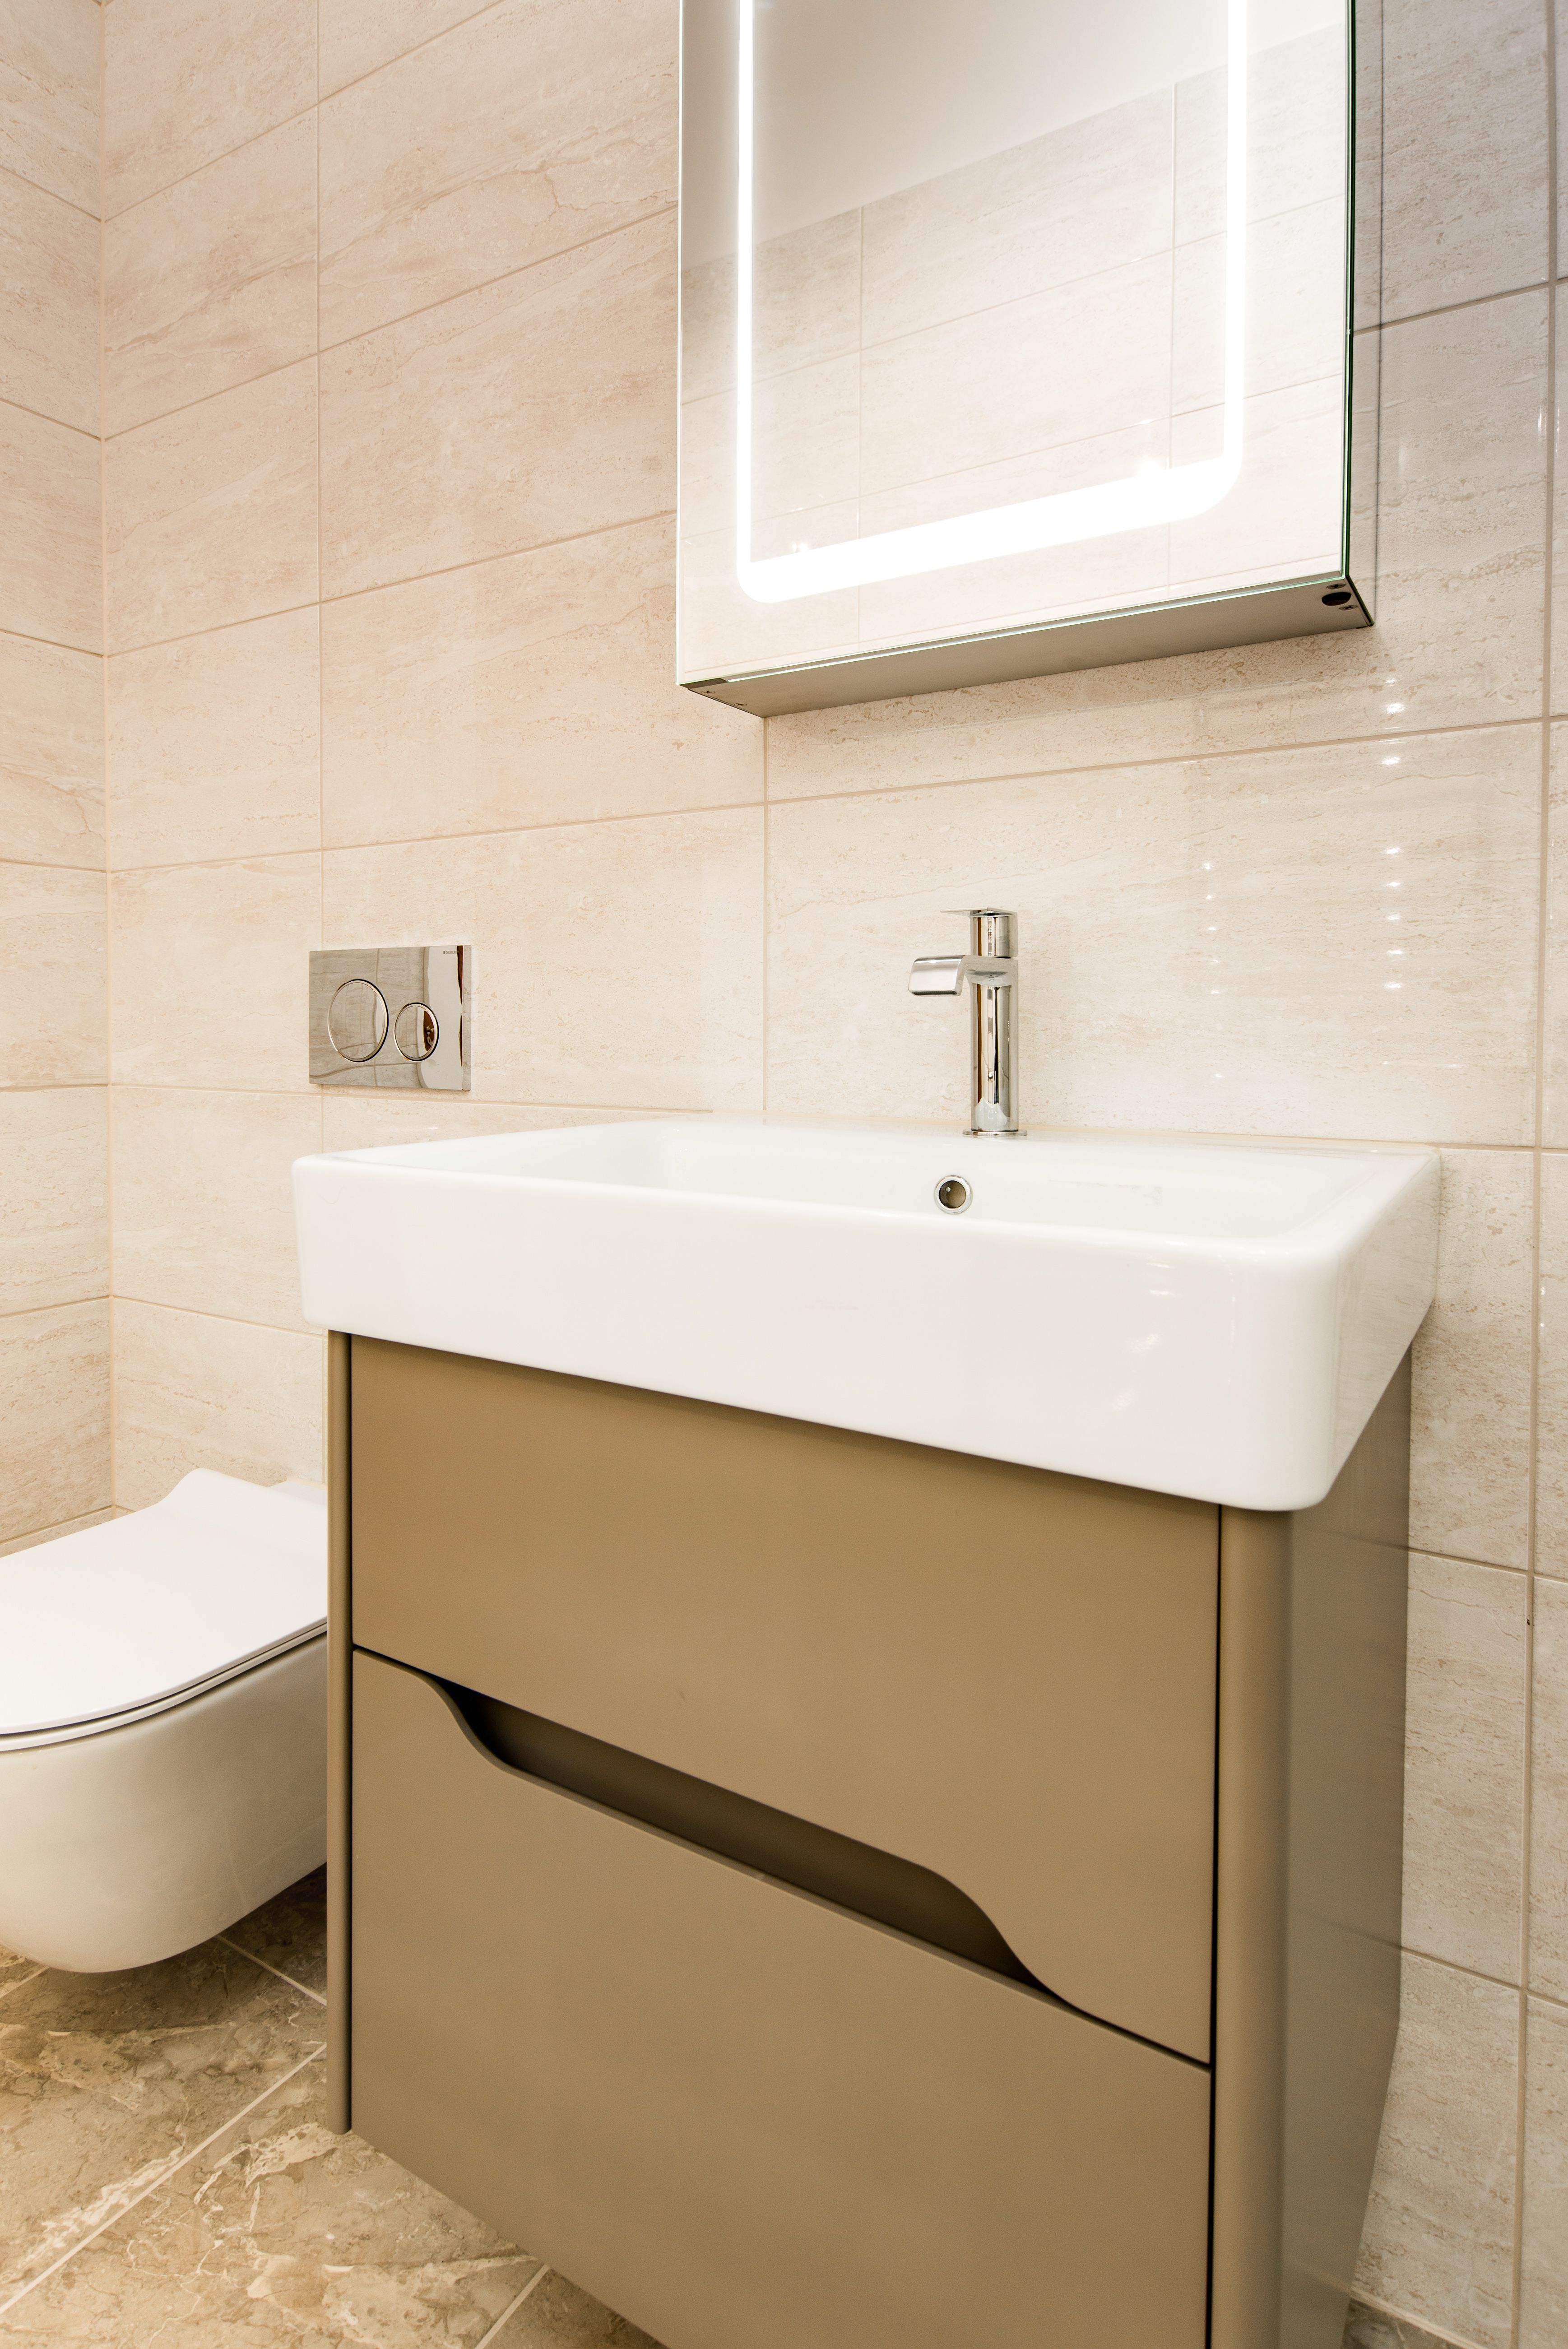 En Suite Shower Room In Goudhurst, Kent Featuring Gsi Vanity Unit